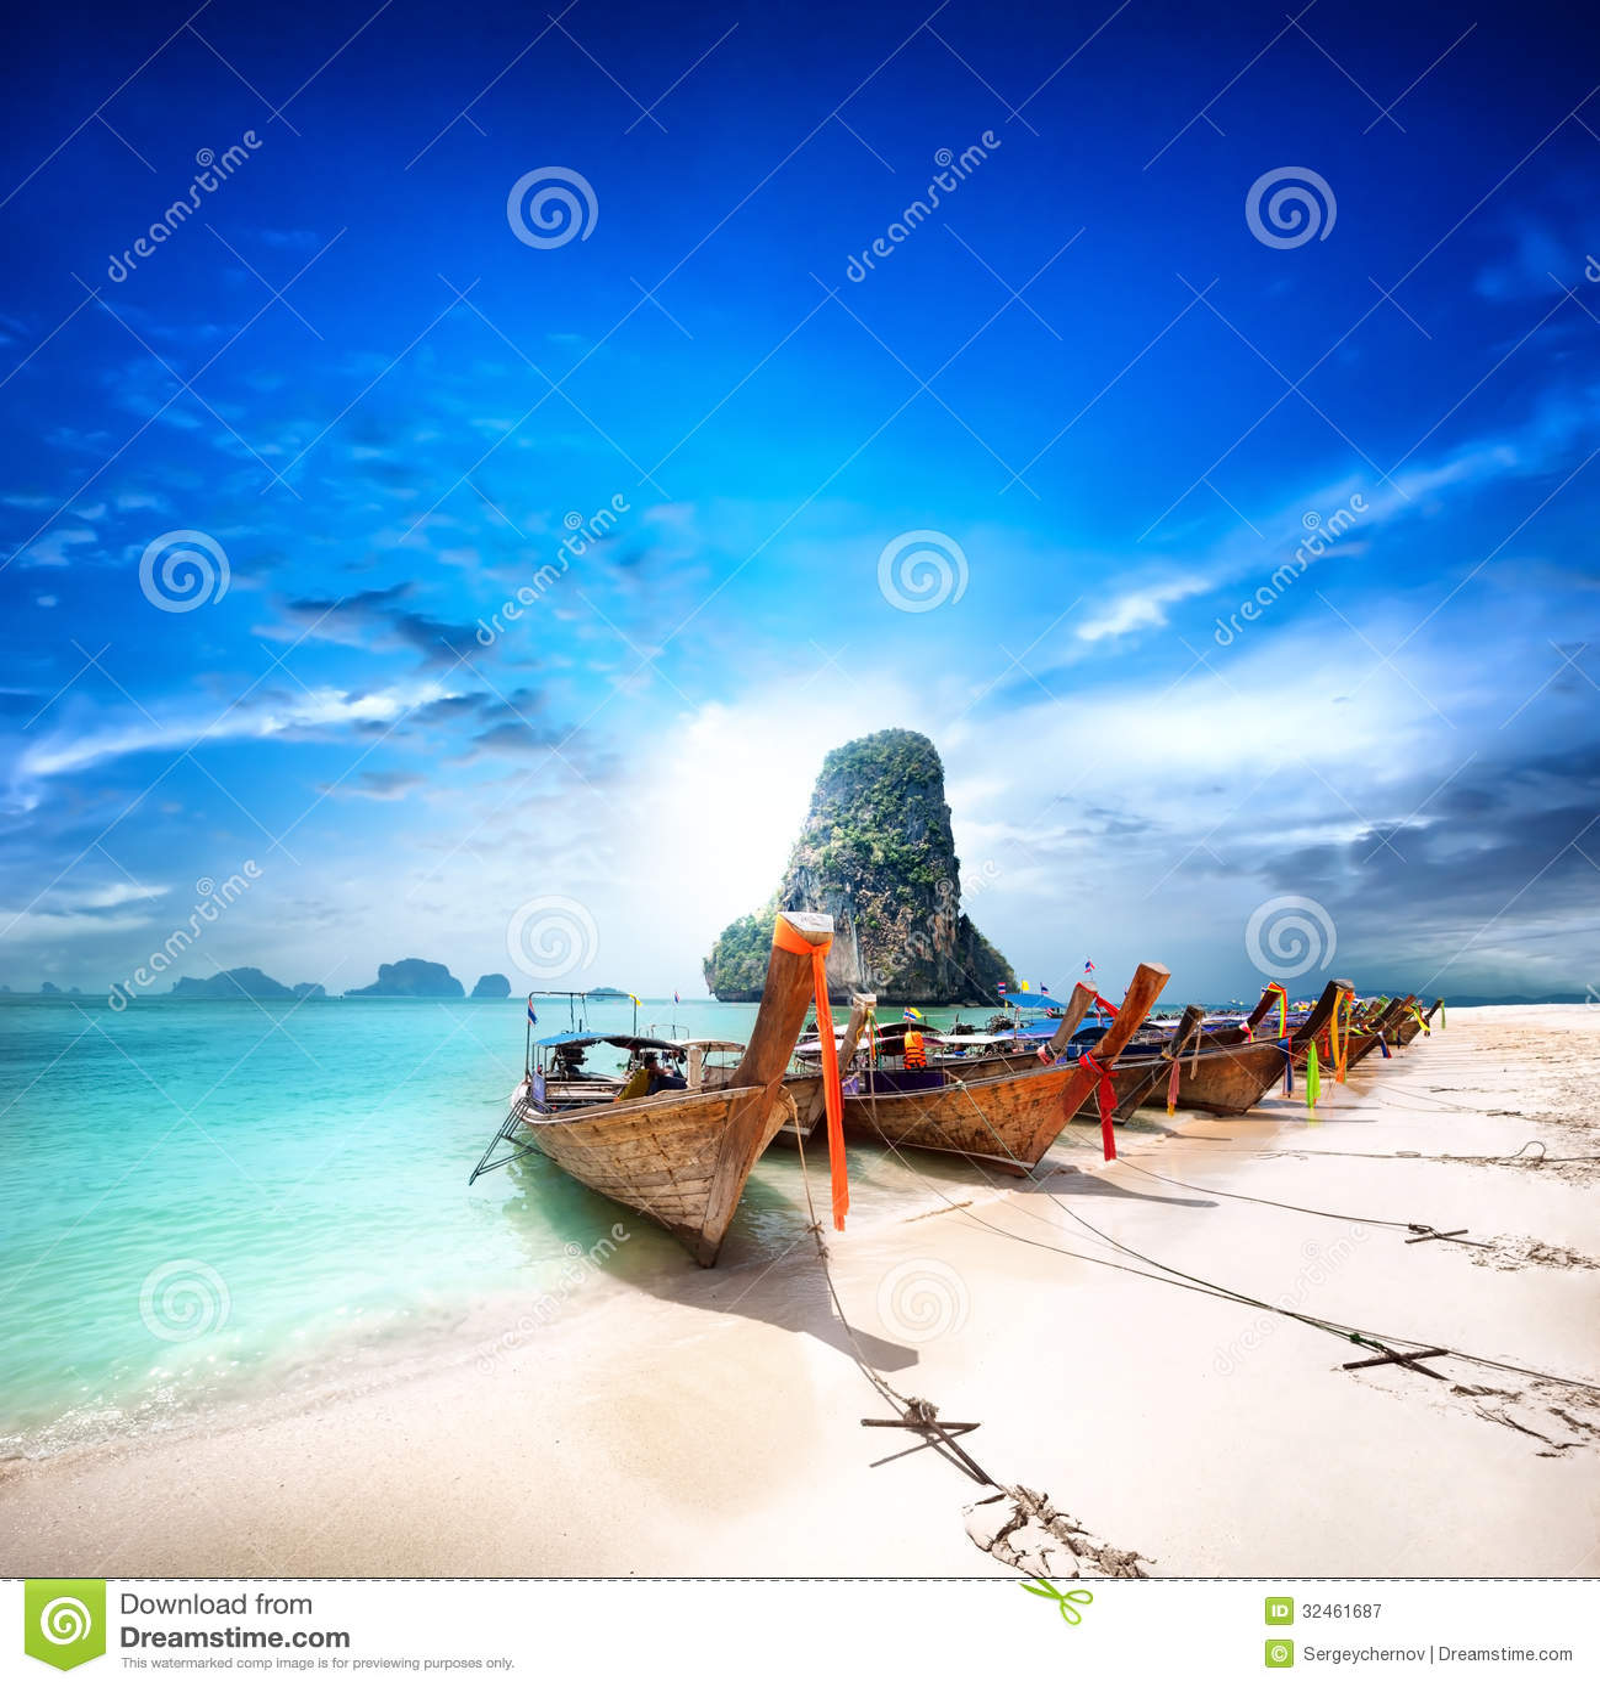 Thailand beach on tropical island. Beautiful travel background